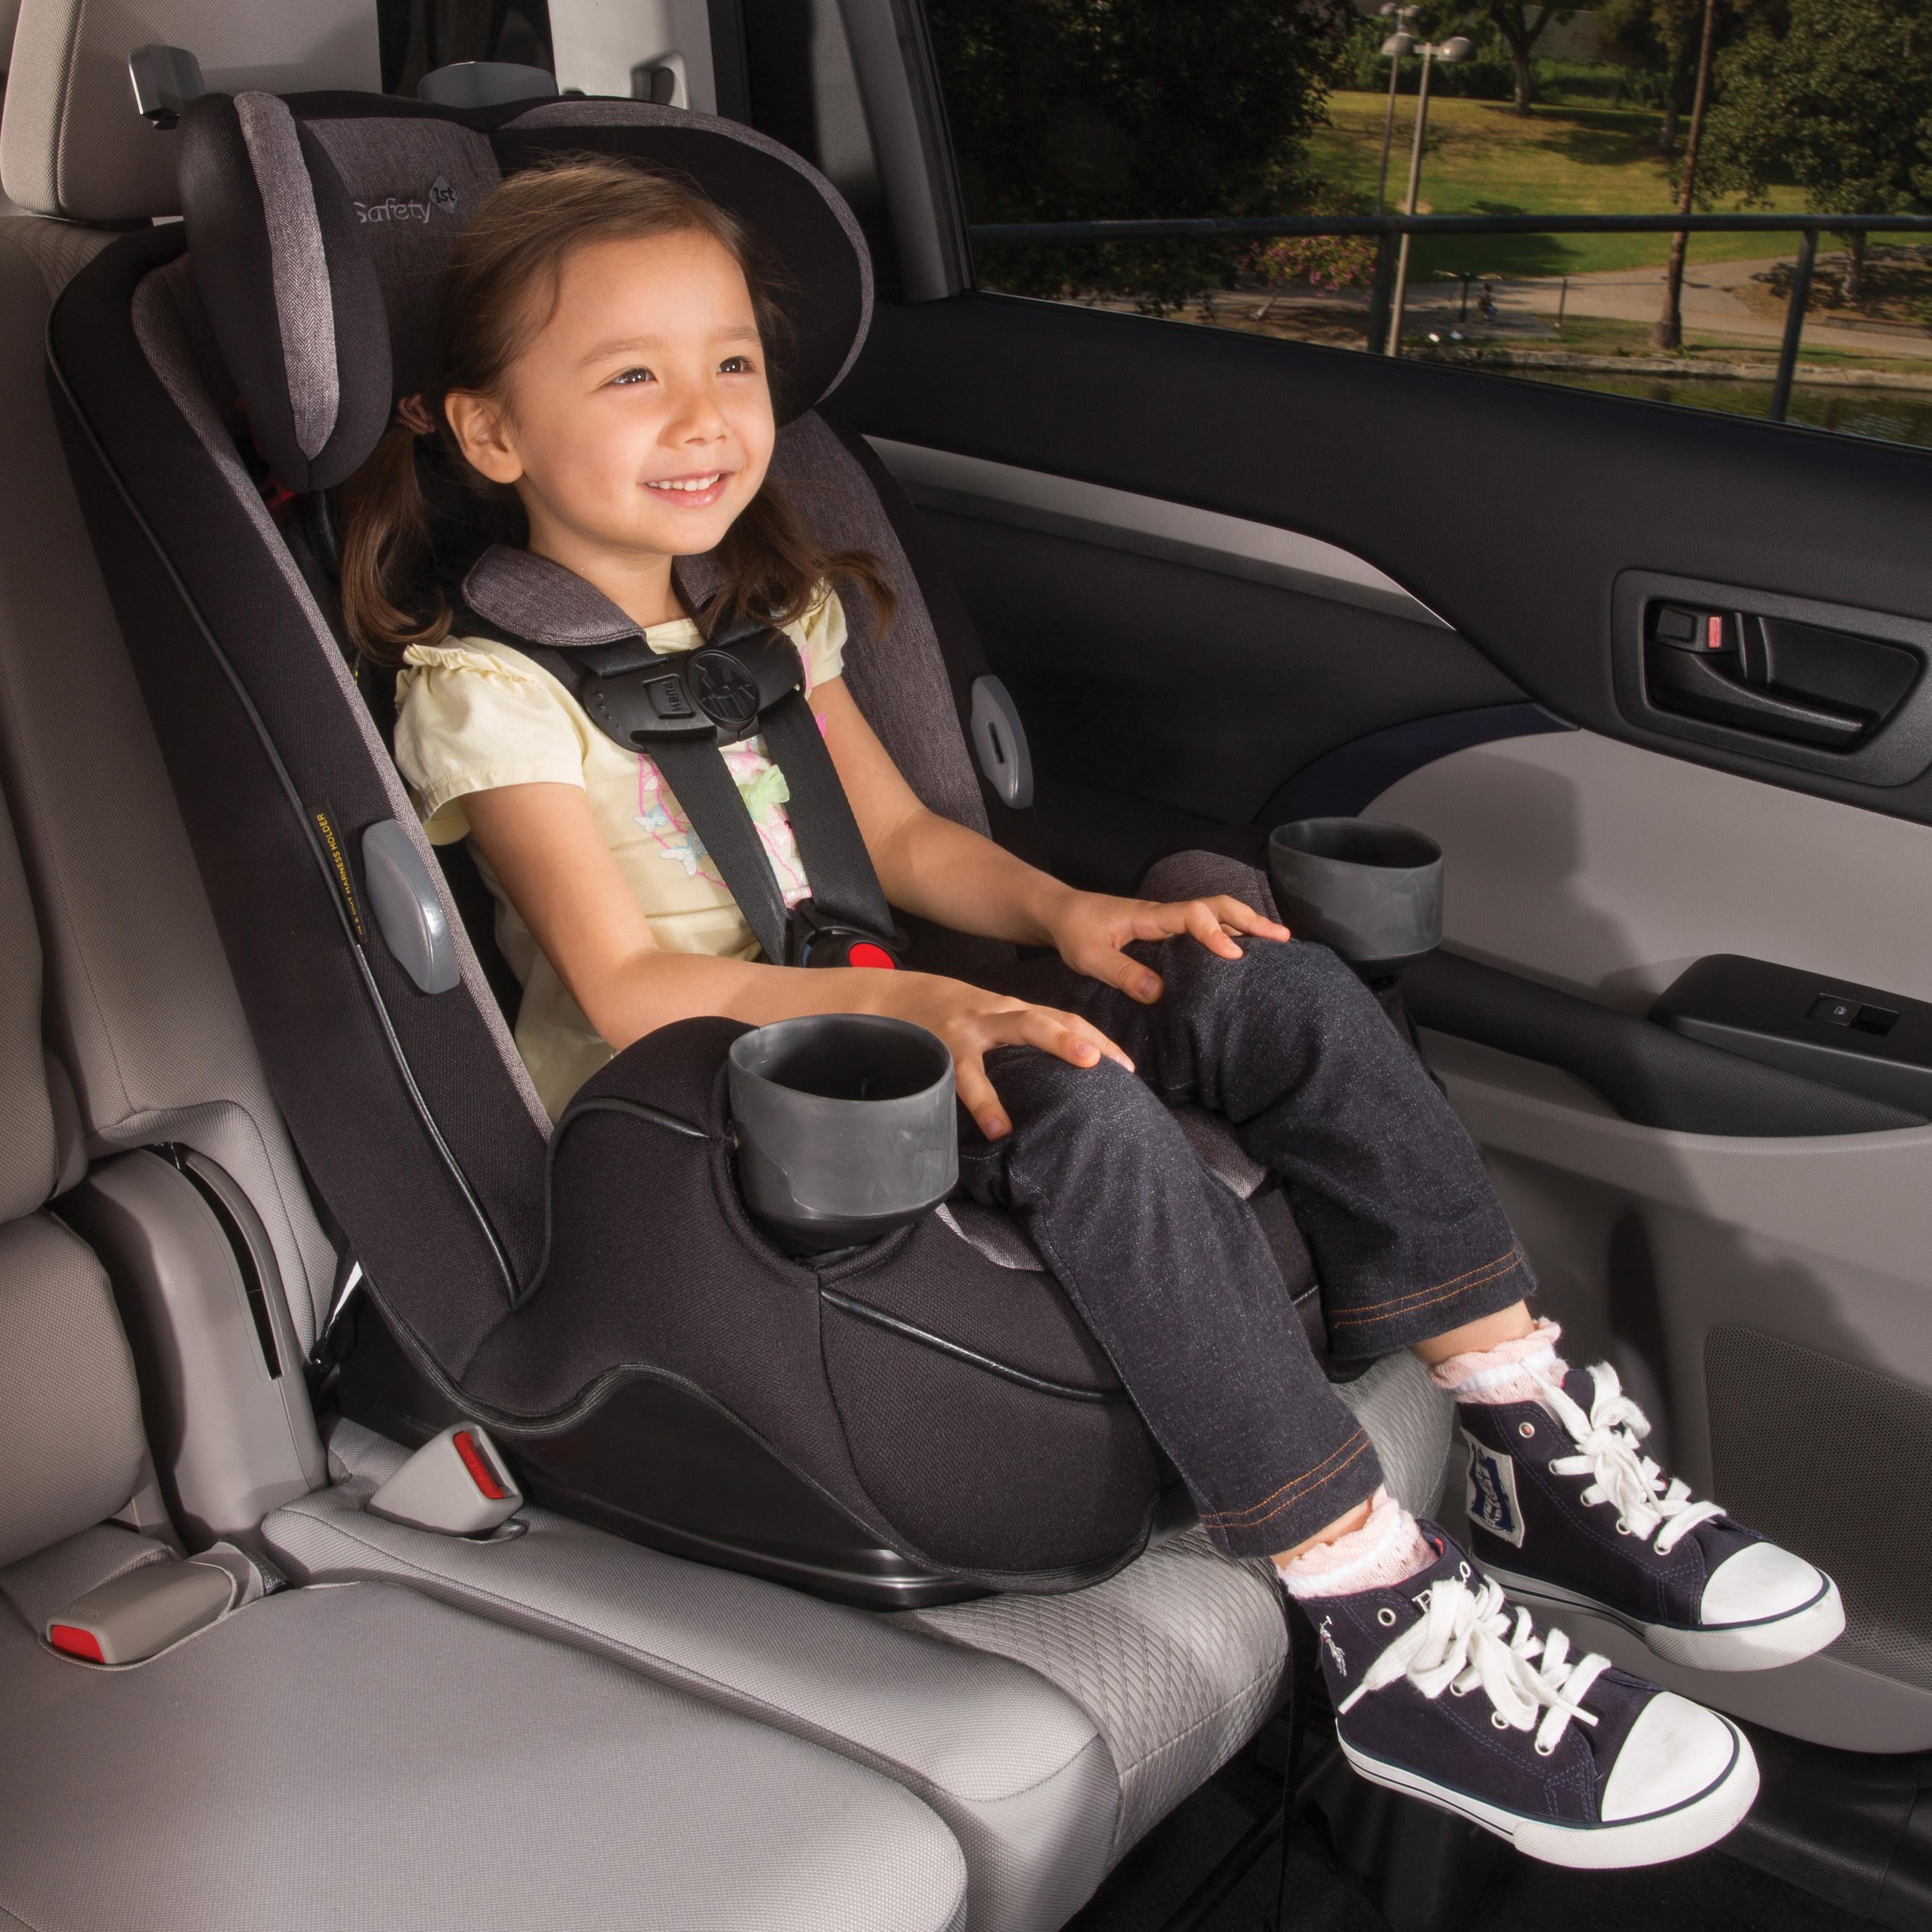 Safety 1st Raises Awareness For Child Passenger Safety Week Urges